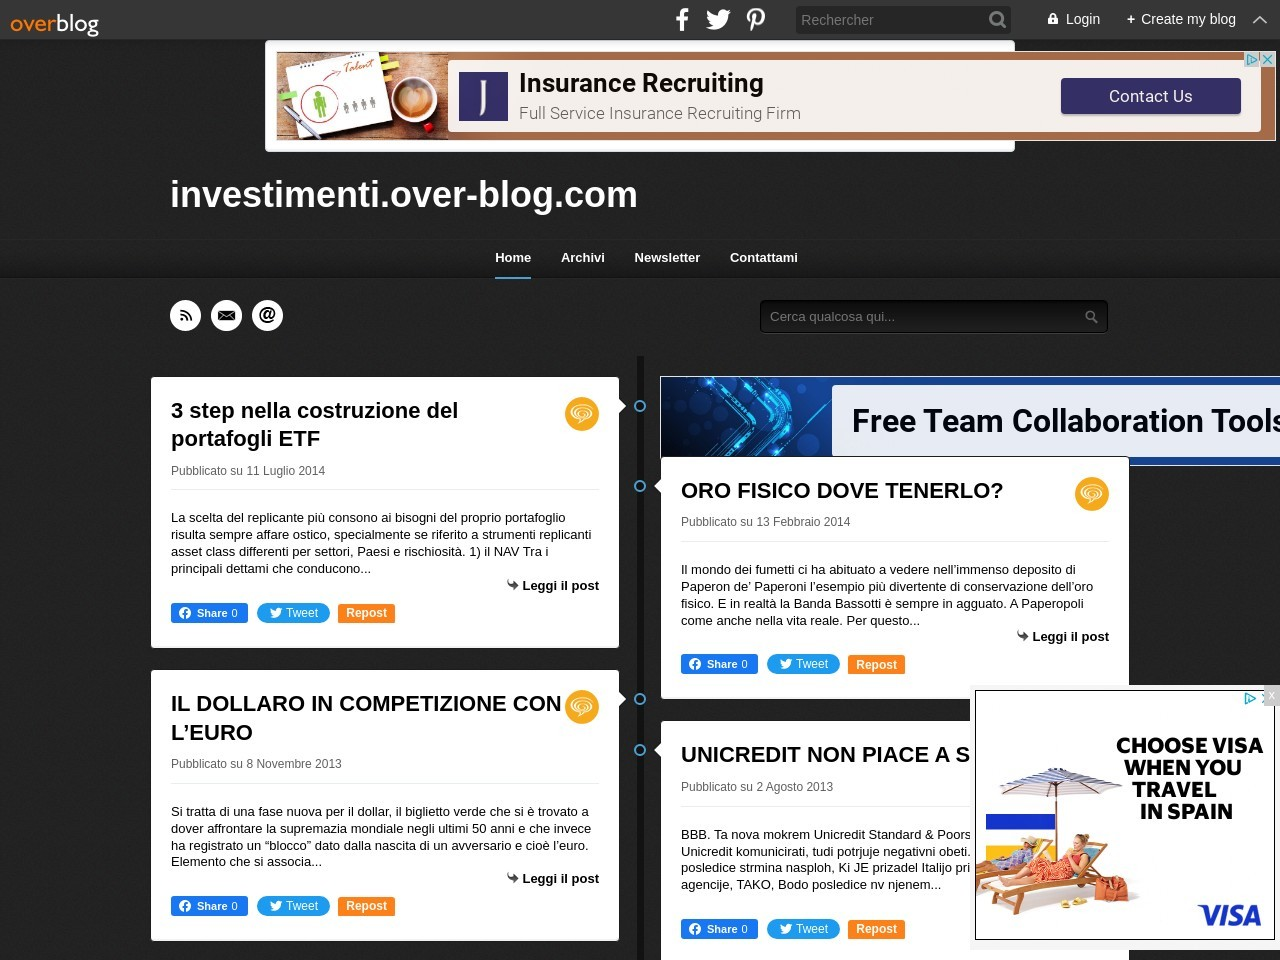 investimenti-over-blog-com